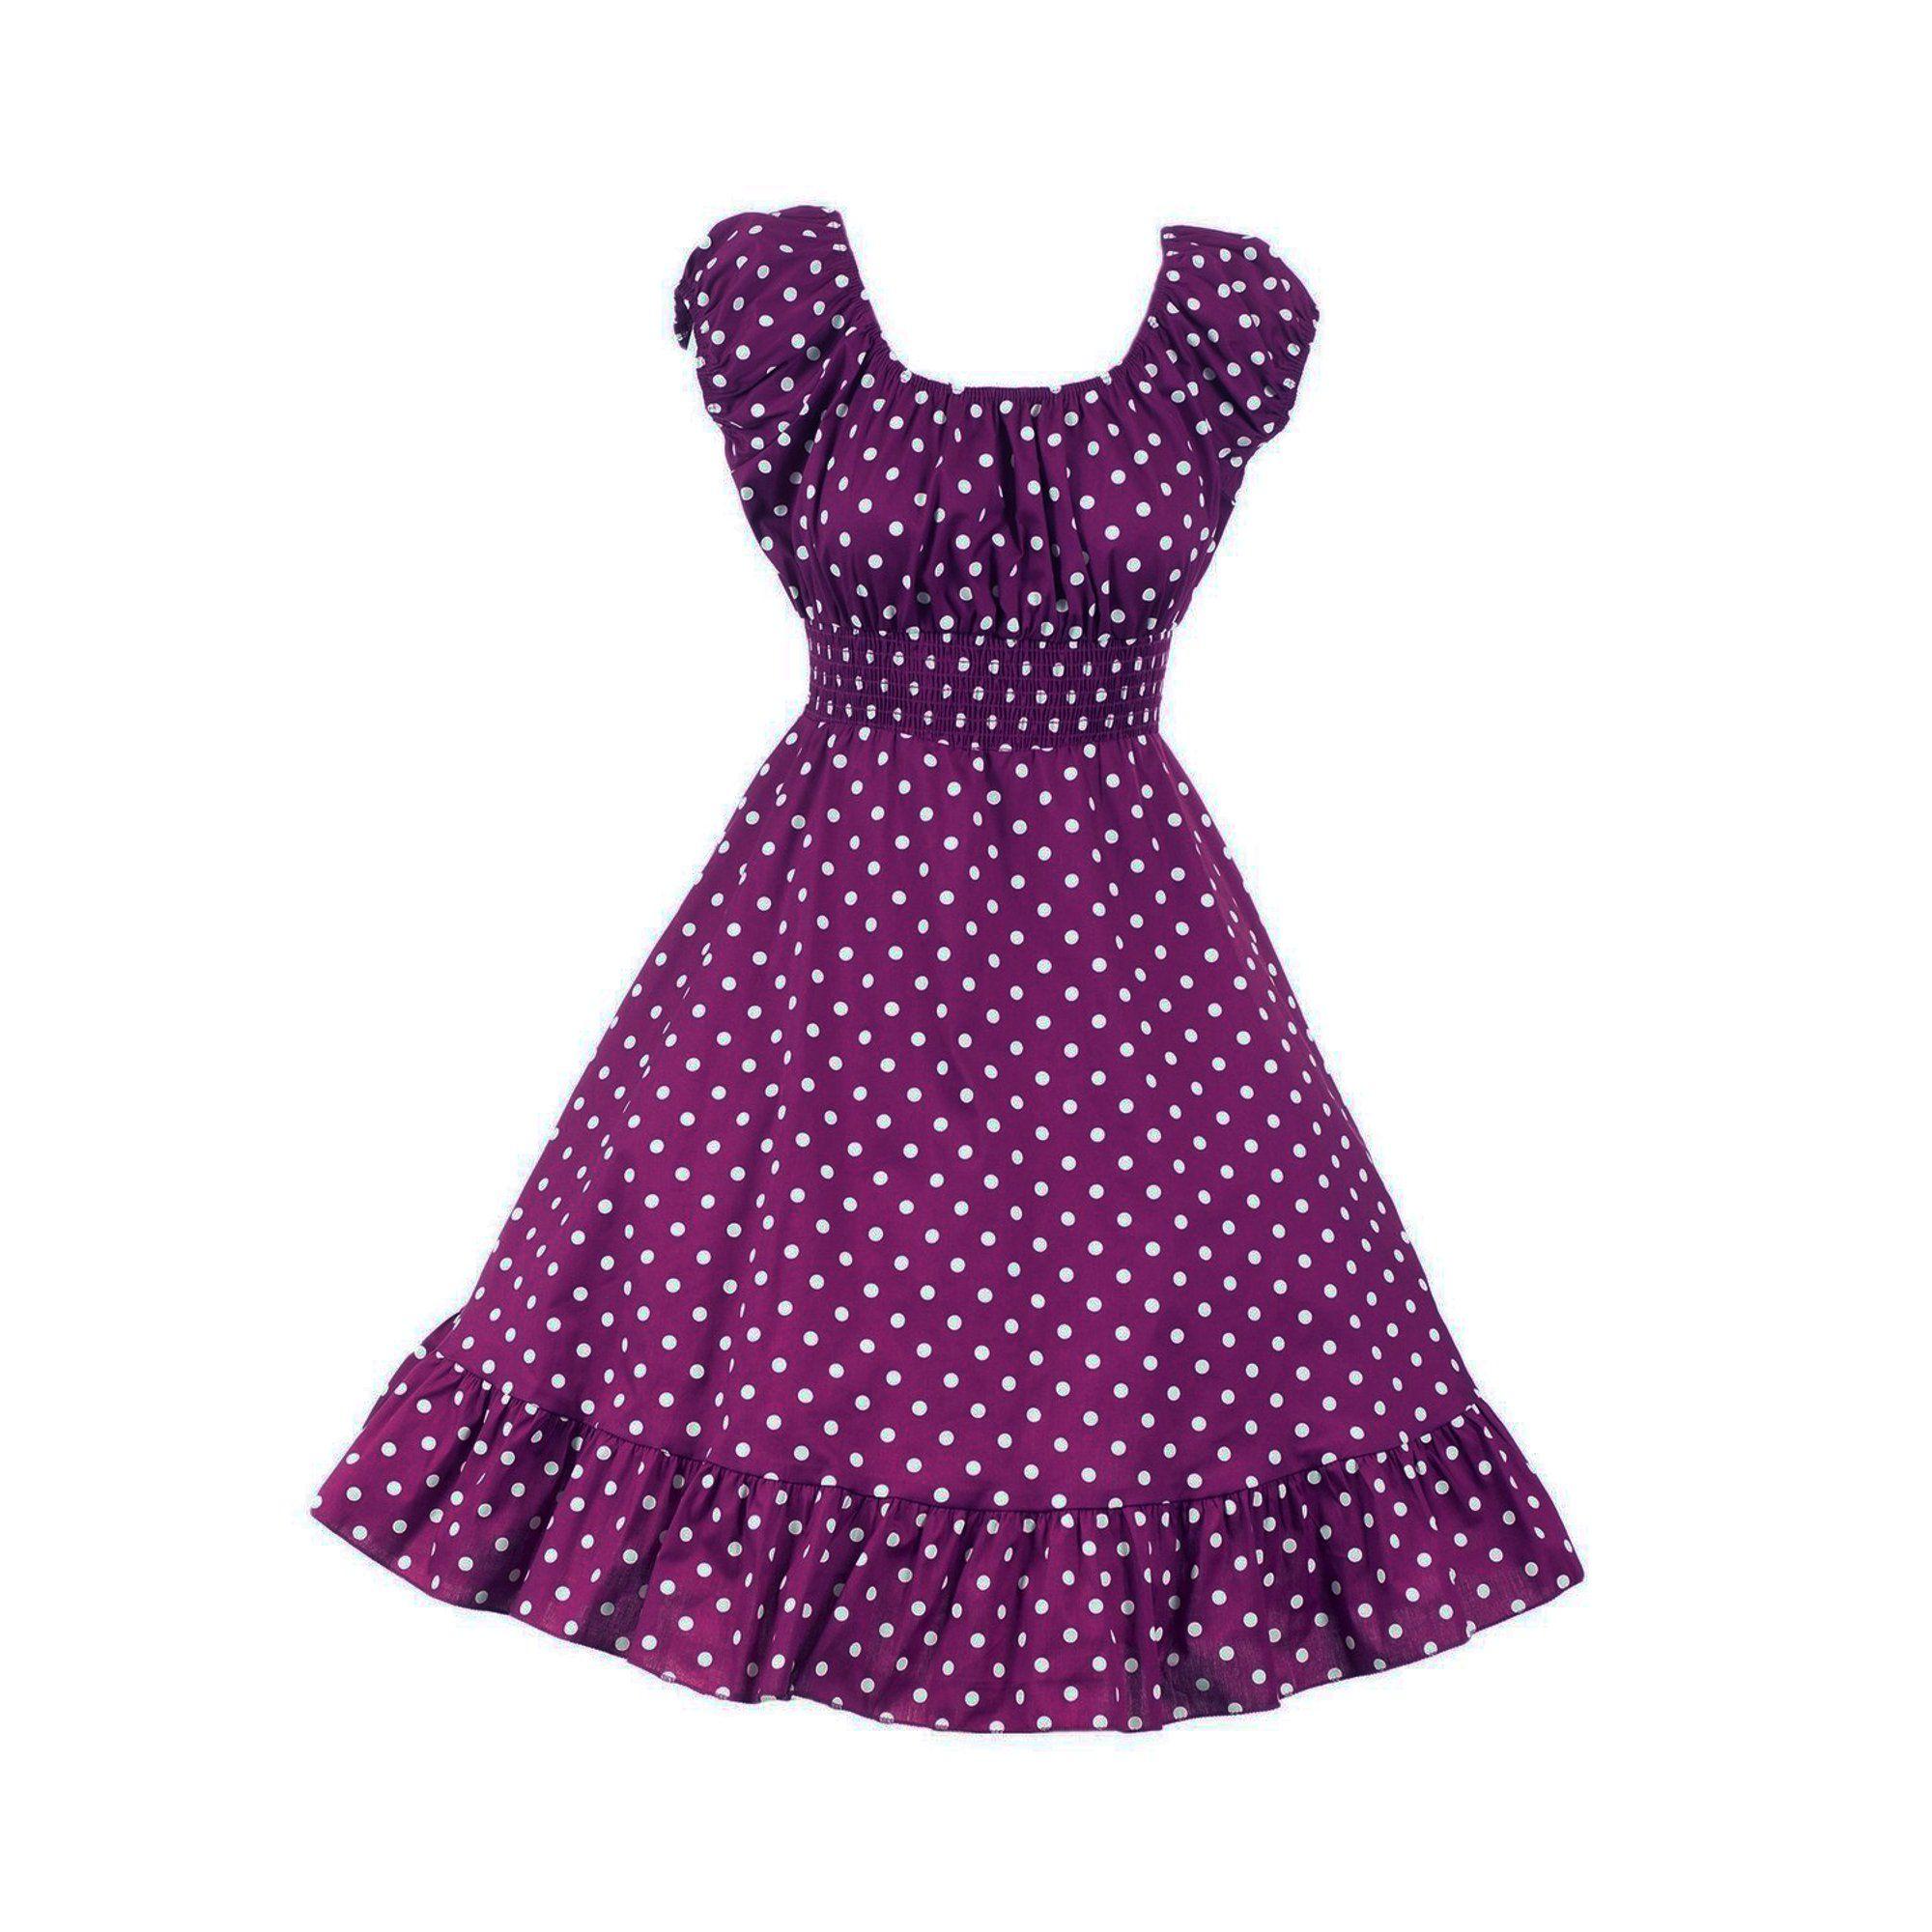 Buddys Usa Vintage 1950s Style Smock Peasant Empire Polka Dot Dress Purple M W28 Walmart Com In 2021 Polka Dot Dress Dot Dress 1950s Fashion [ 2000 x 2000 Pixel ]